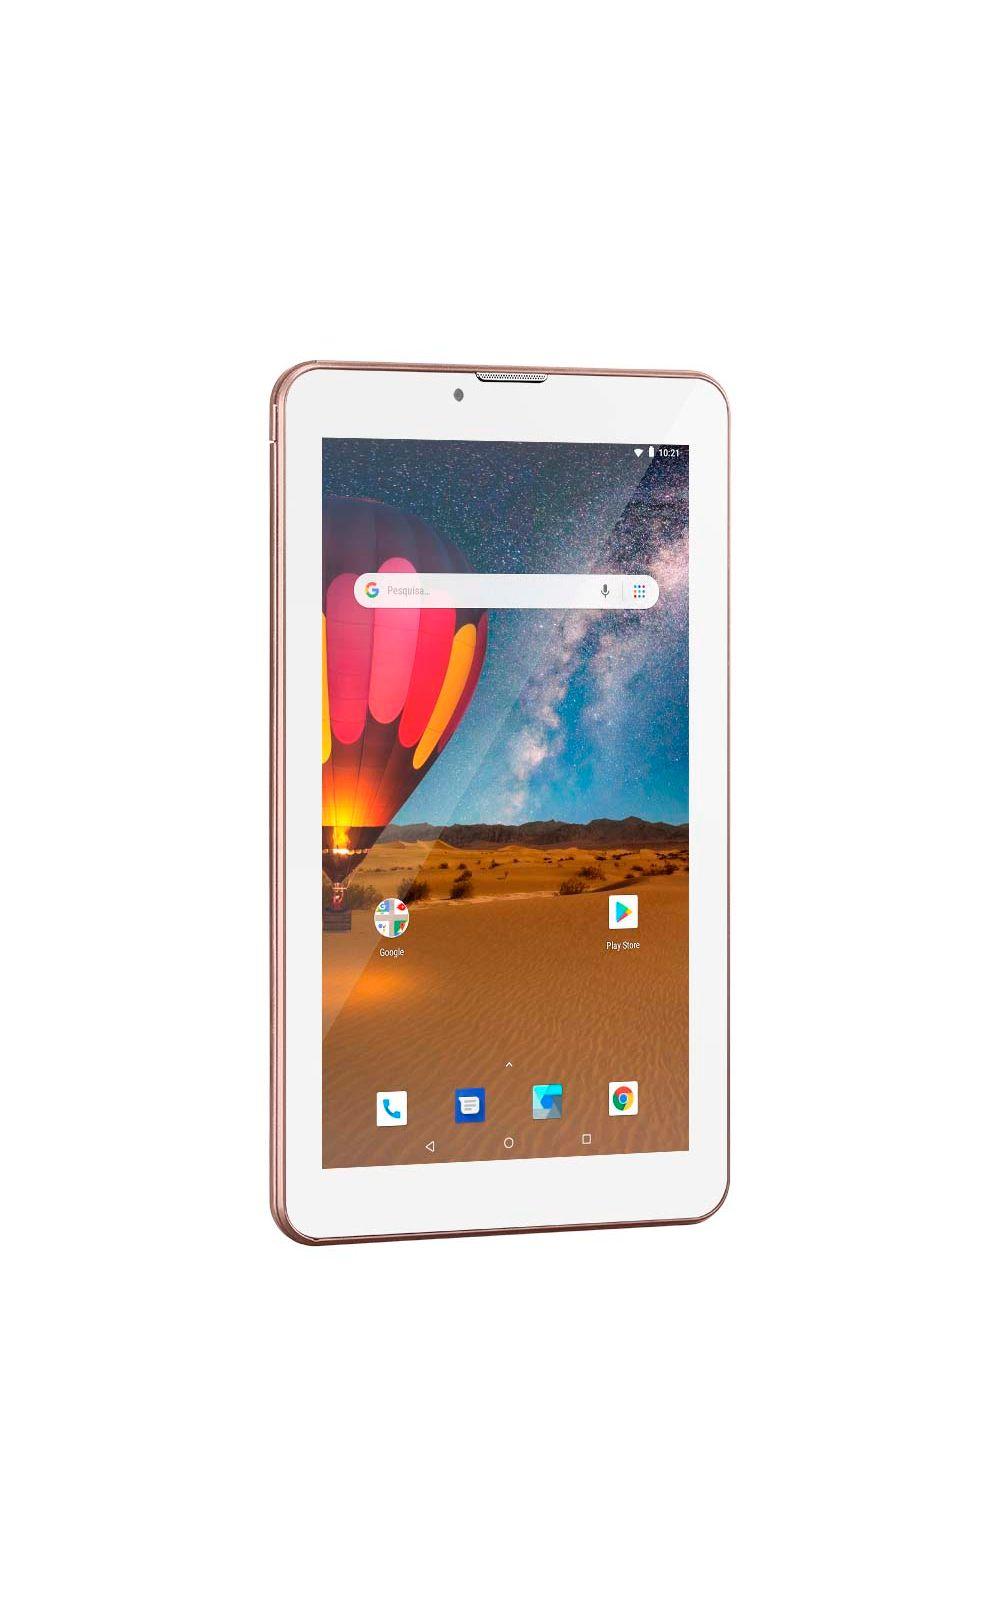 Foto 2 - Tablet Multilaser M7 3G Plus Dual Chip Quad Core 1 GB de Ram Memória 16 GB Tela 7 Polegadas Rosa - NB305